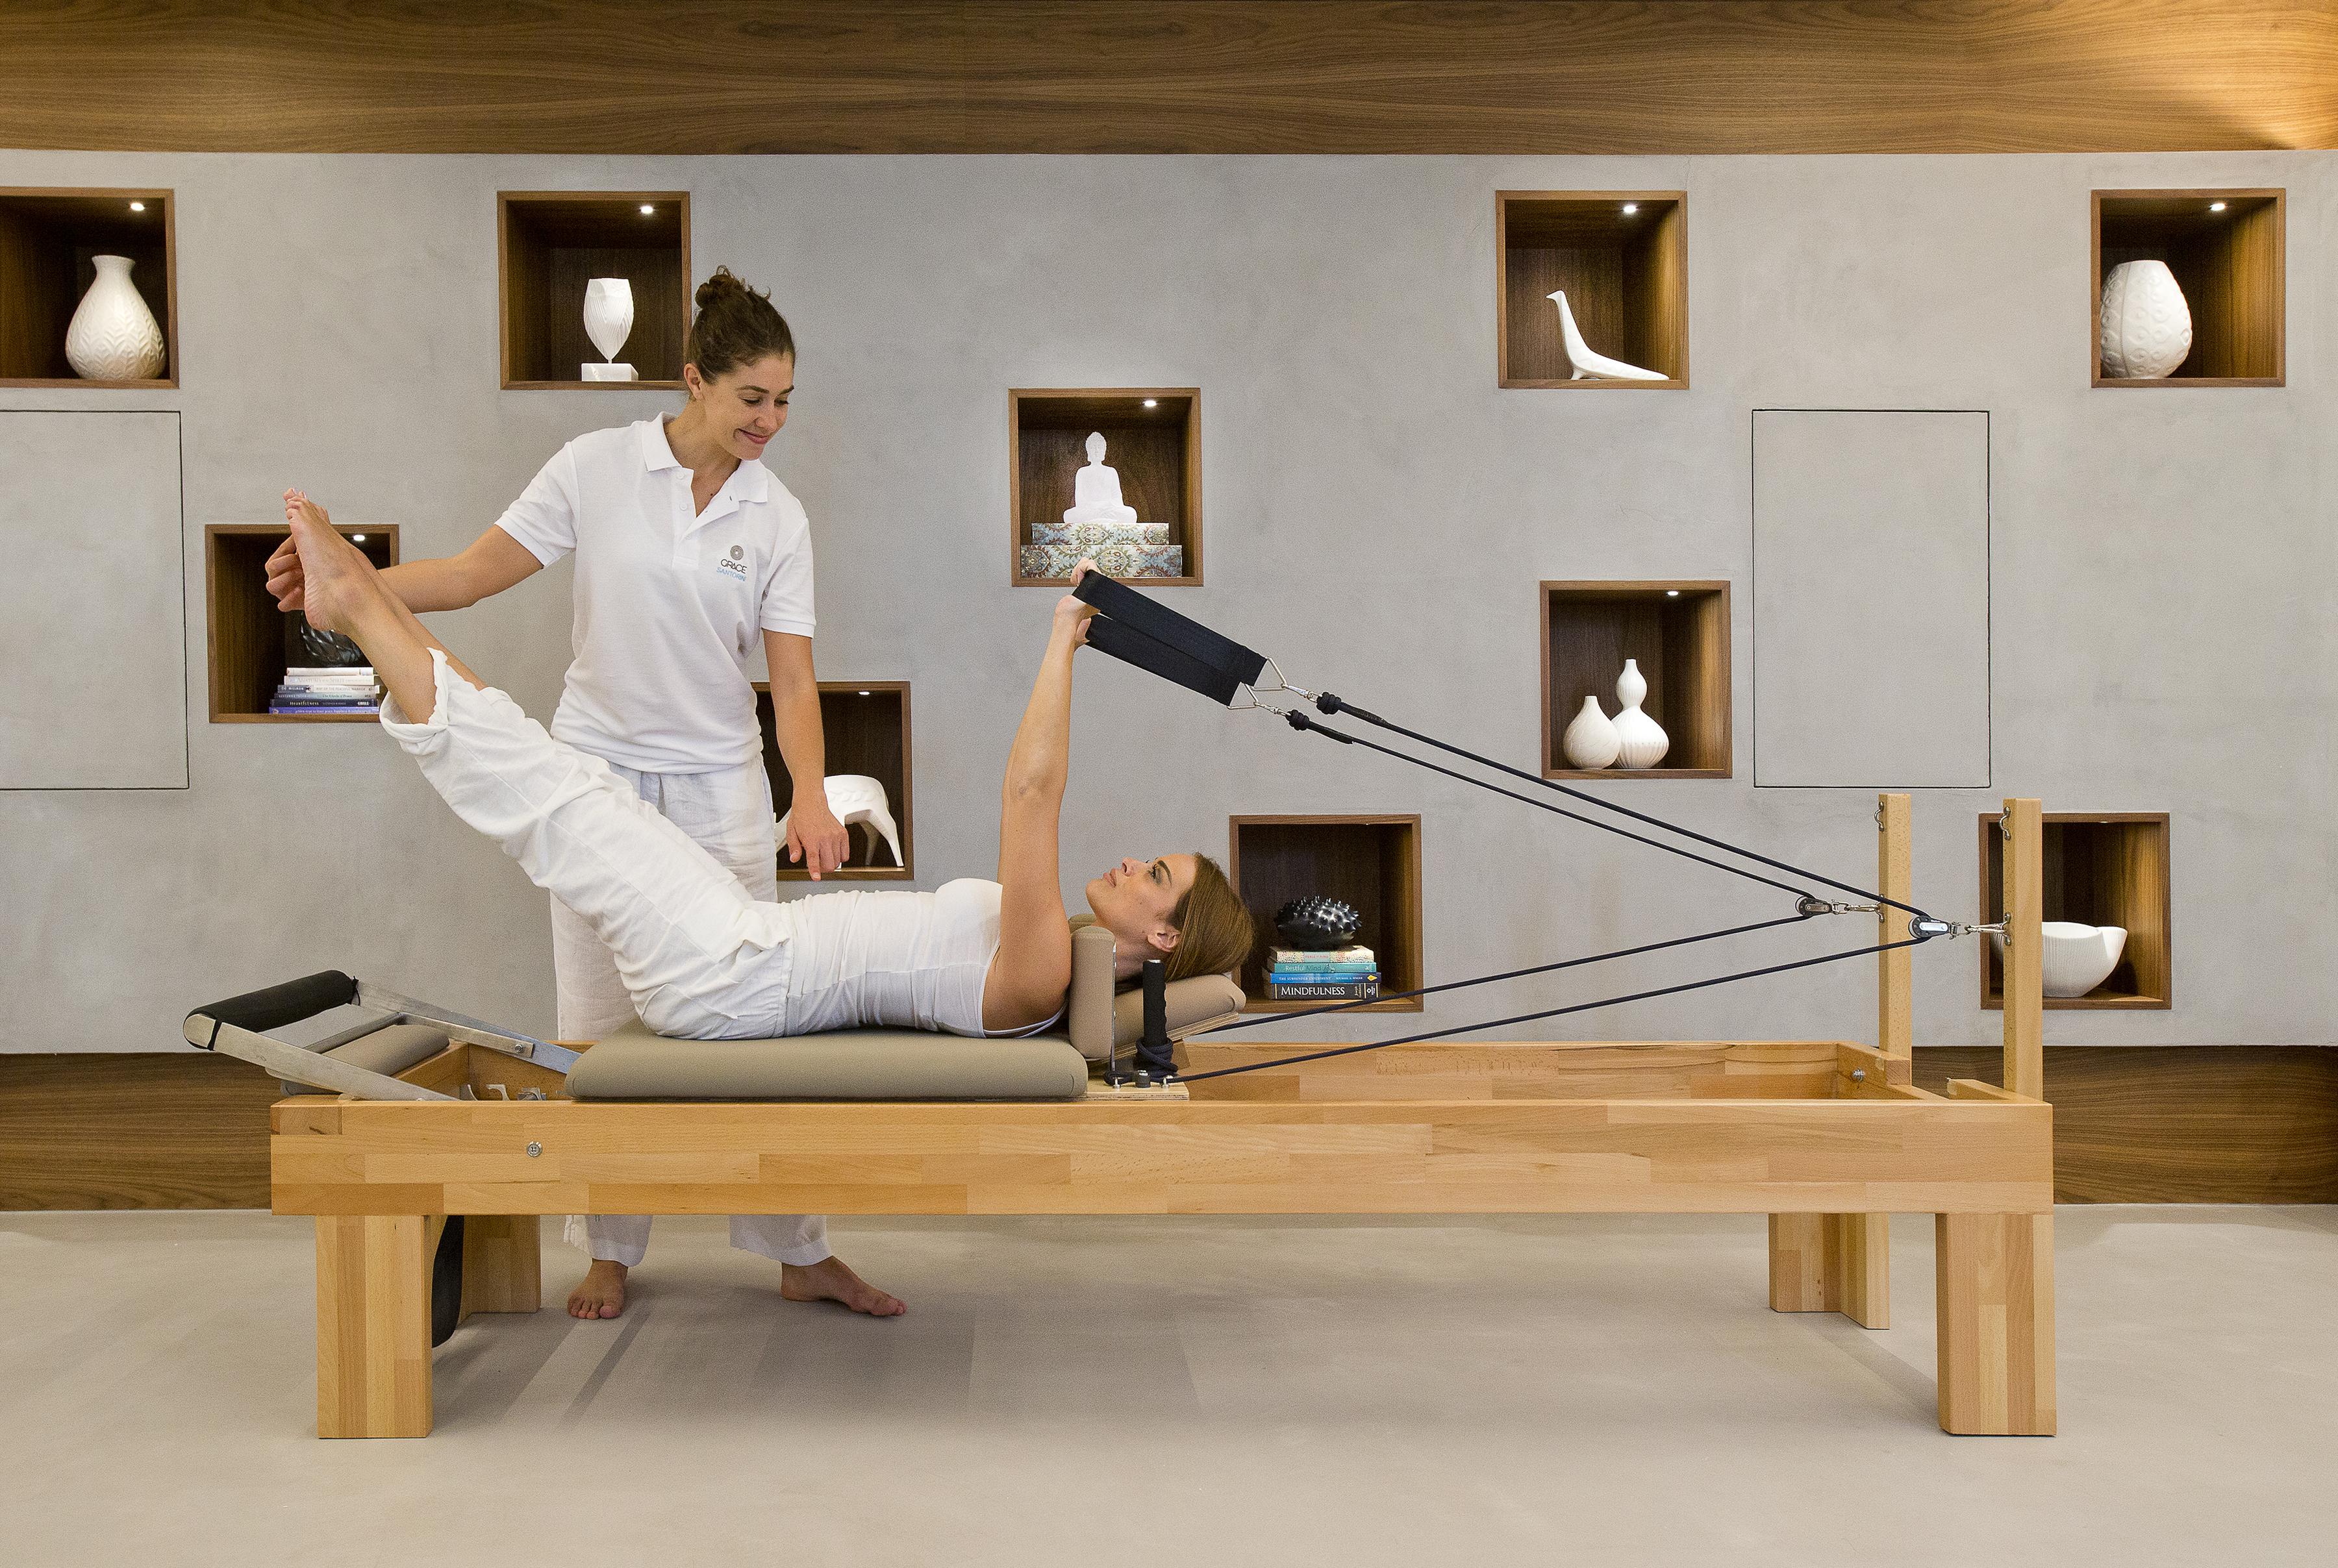 pilates-studio-grace-santorini